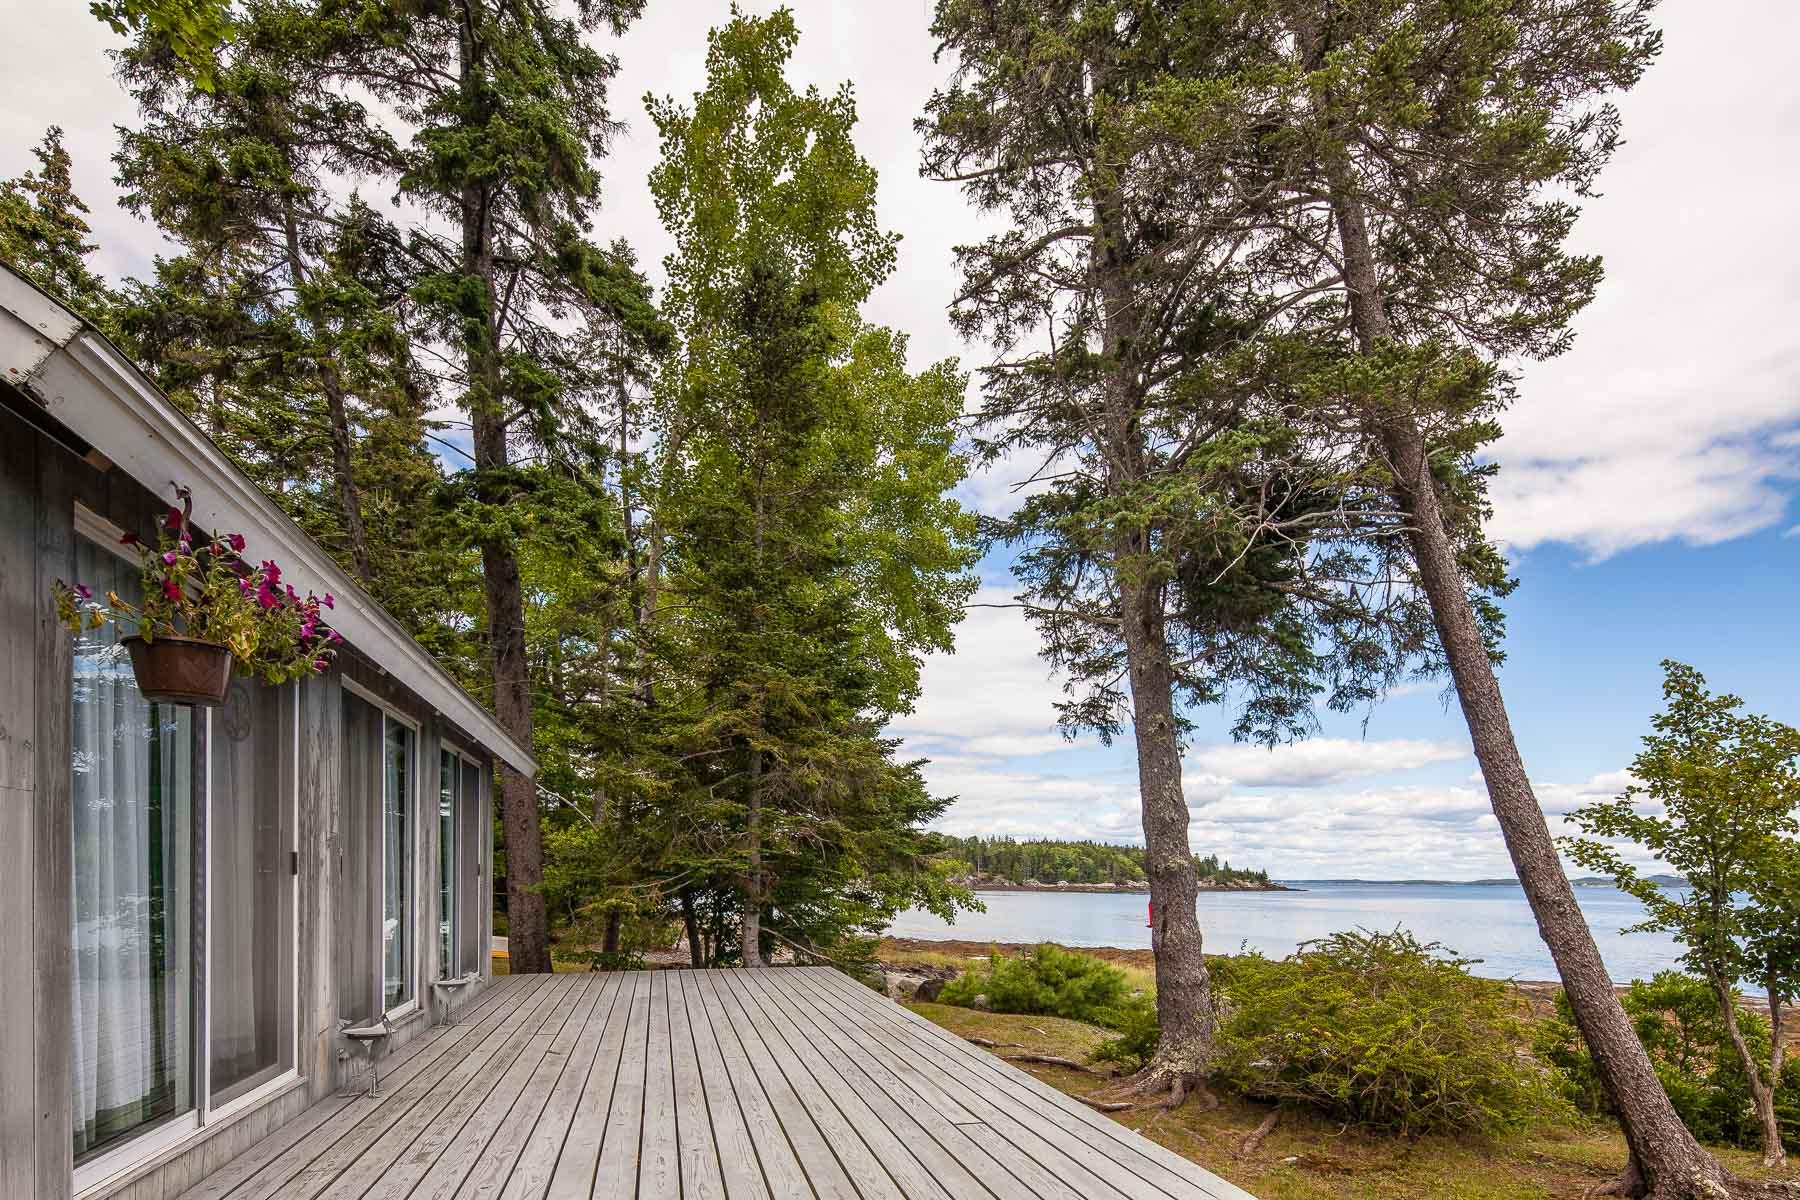 Single Family Home for Sale at 459 Main Road Islesboro, Maine 04848 United States